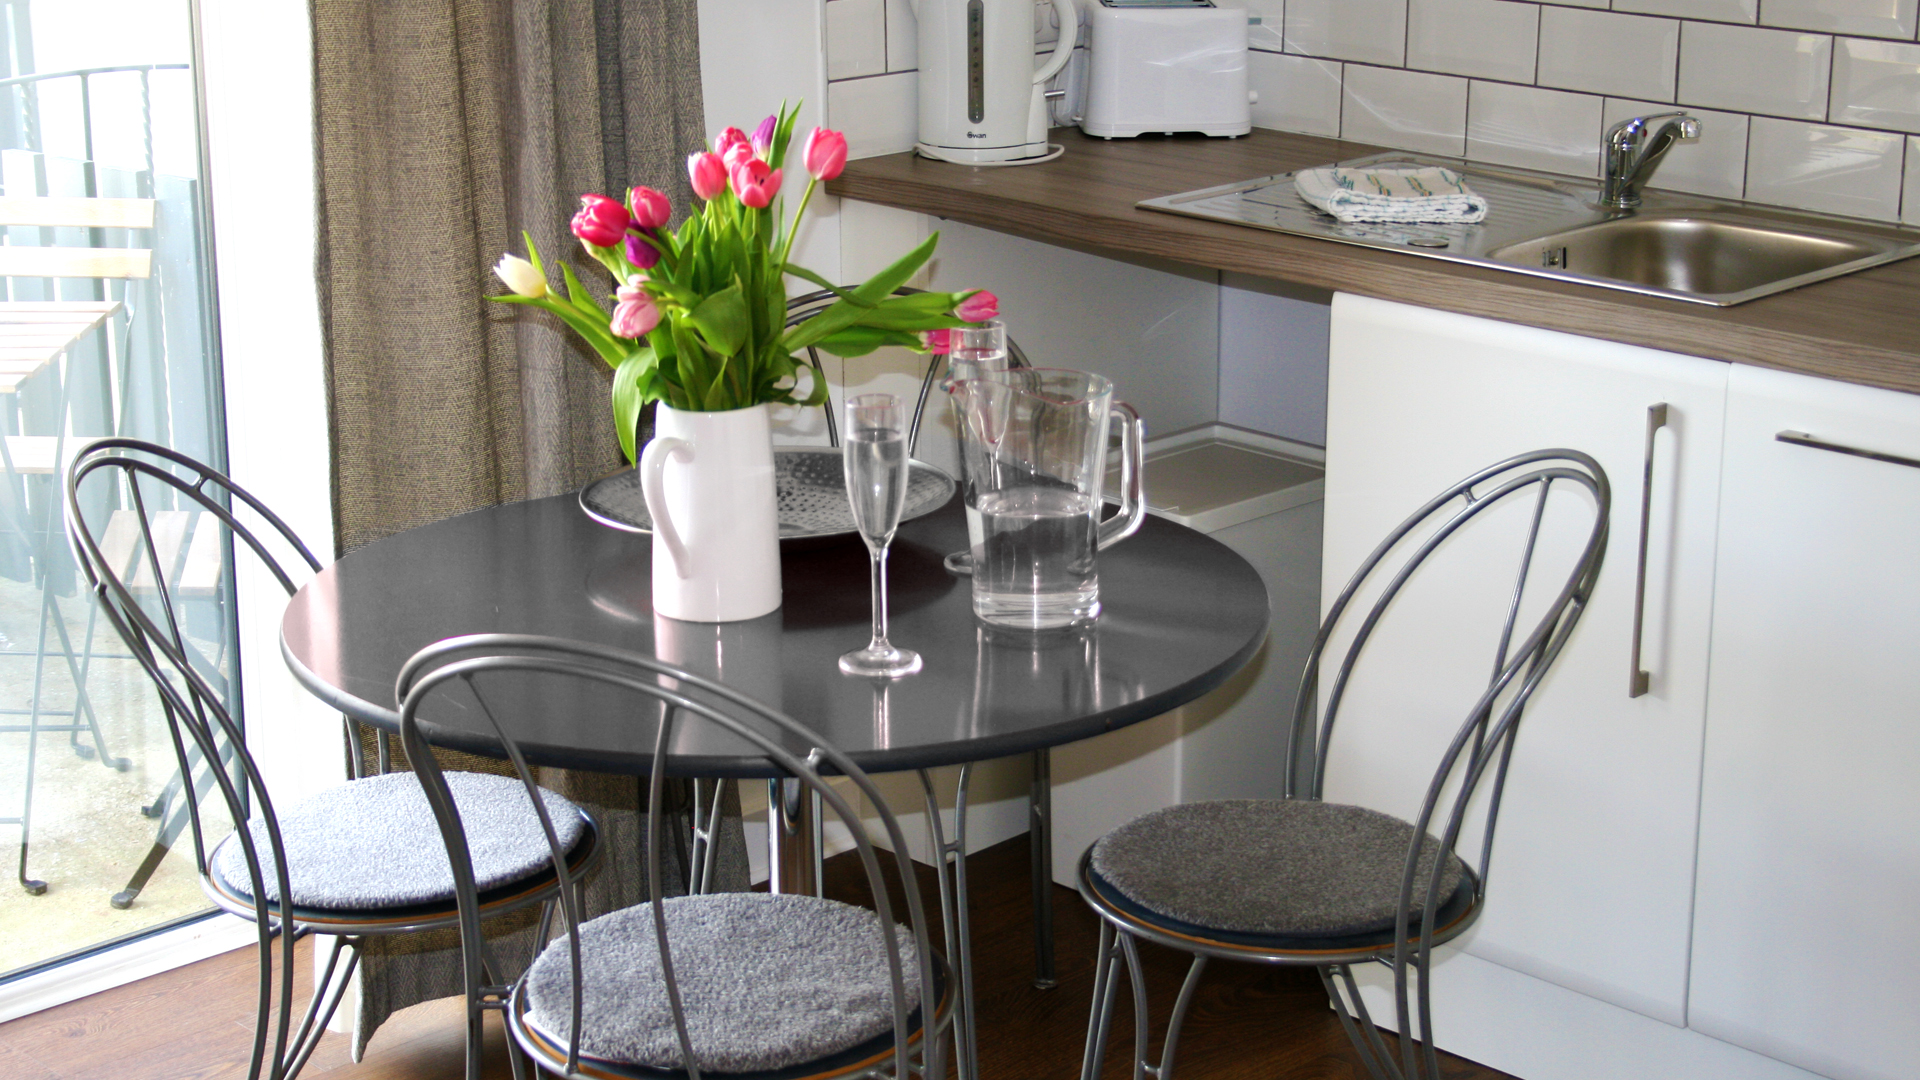 PADDOCK INTERNAL TABLE AND CHAIRS.jpg